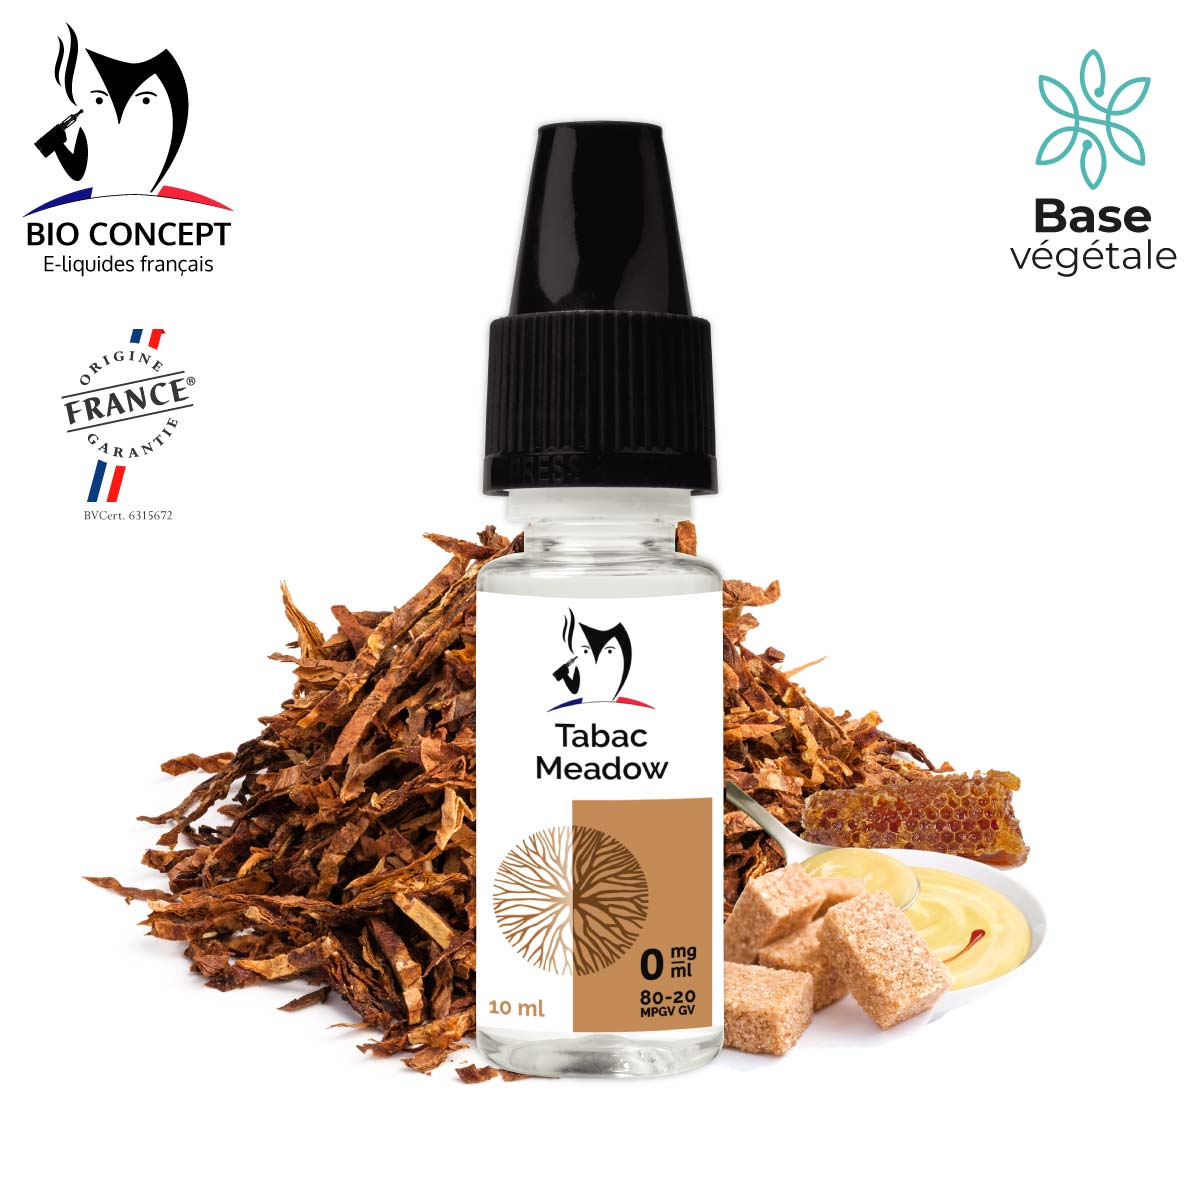 E-liquide Tabac Meadow